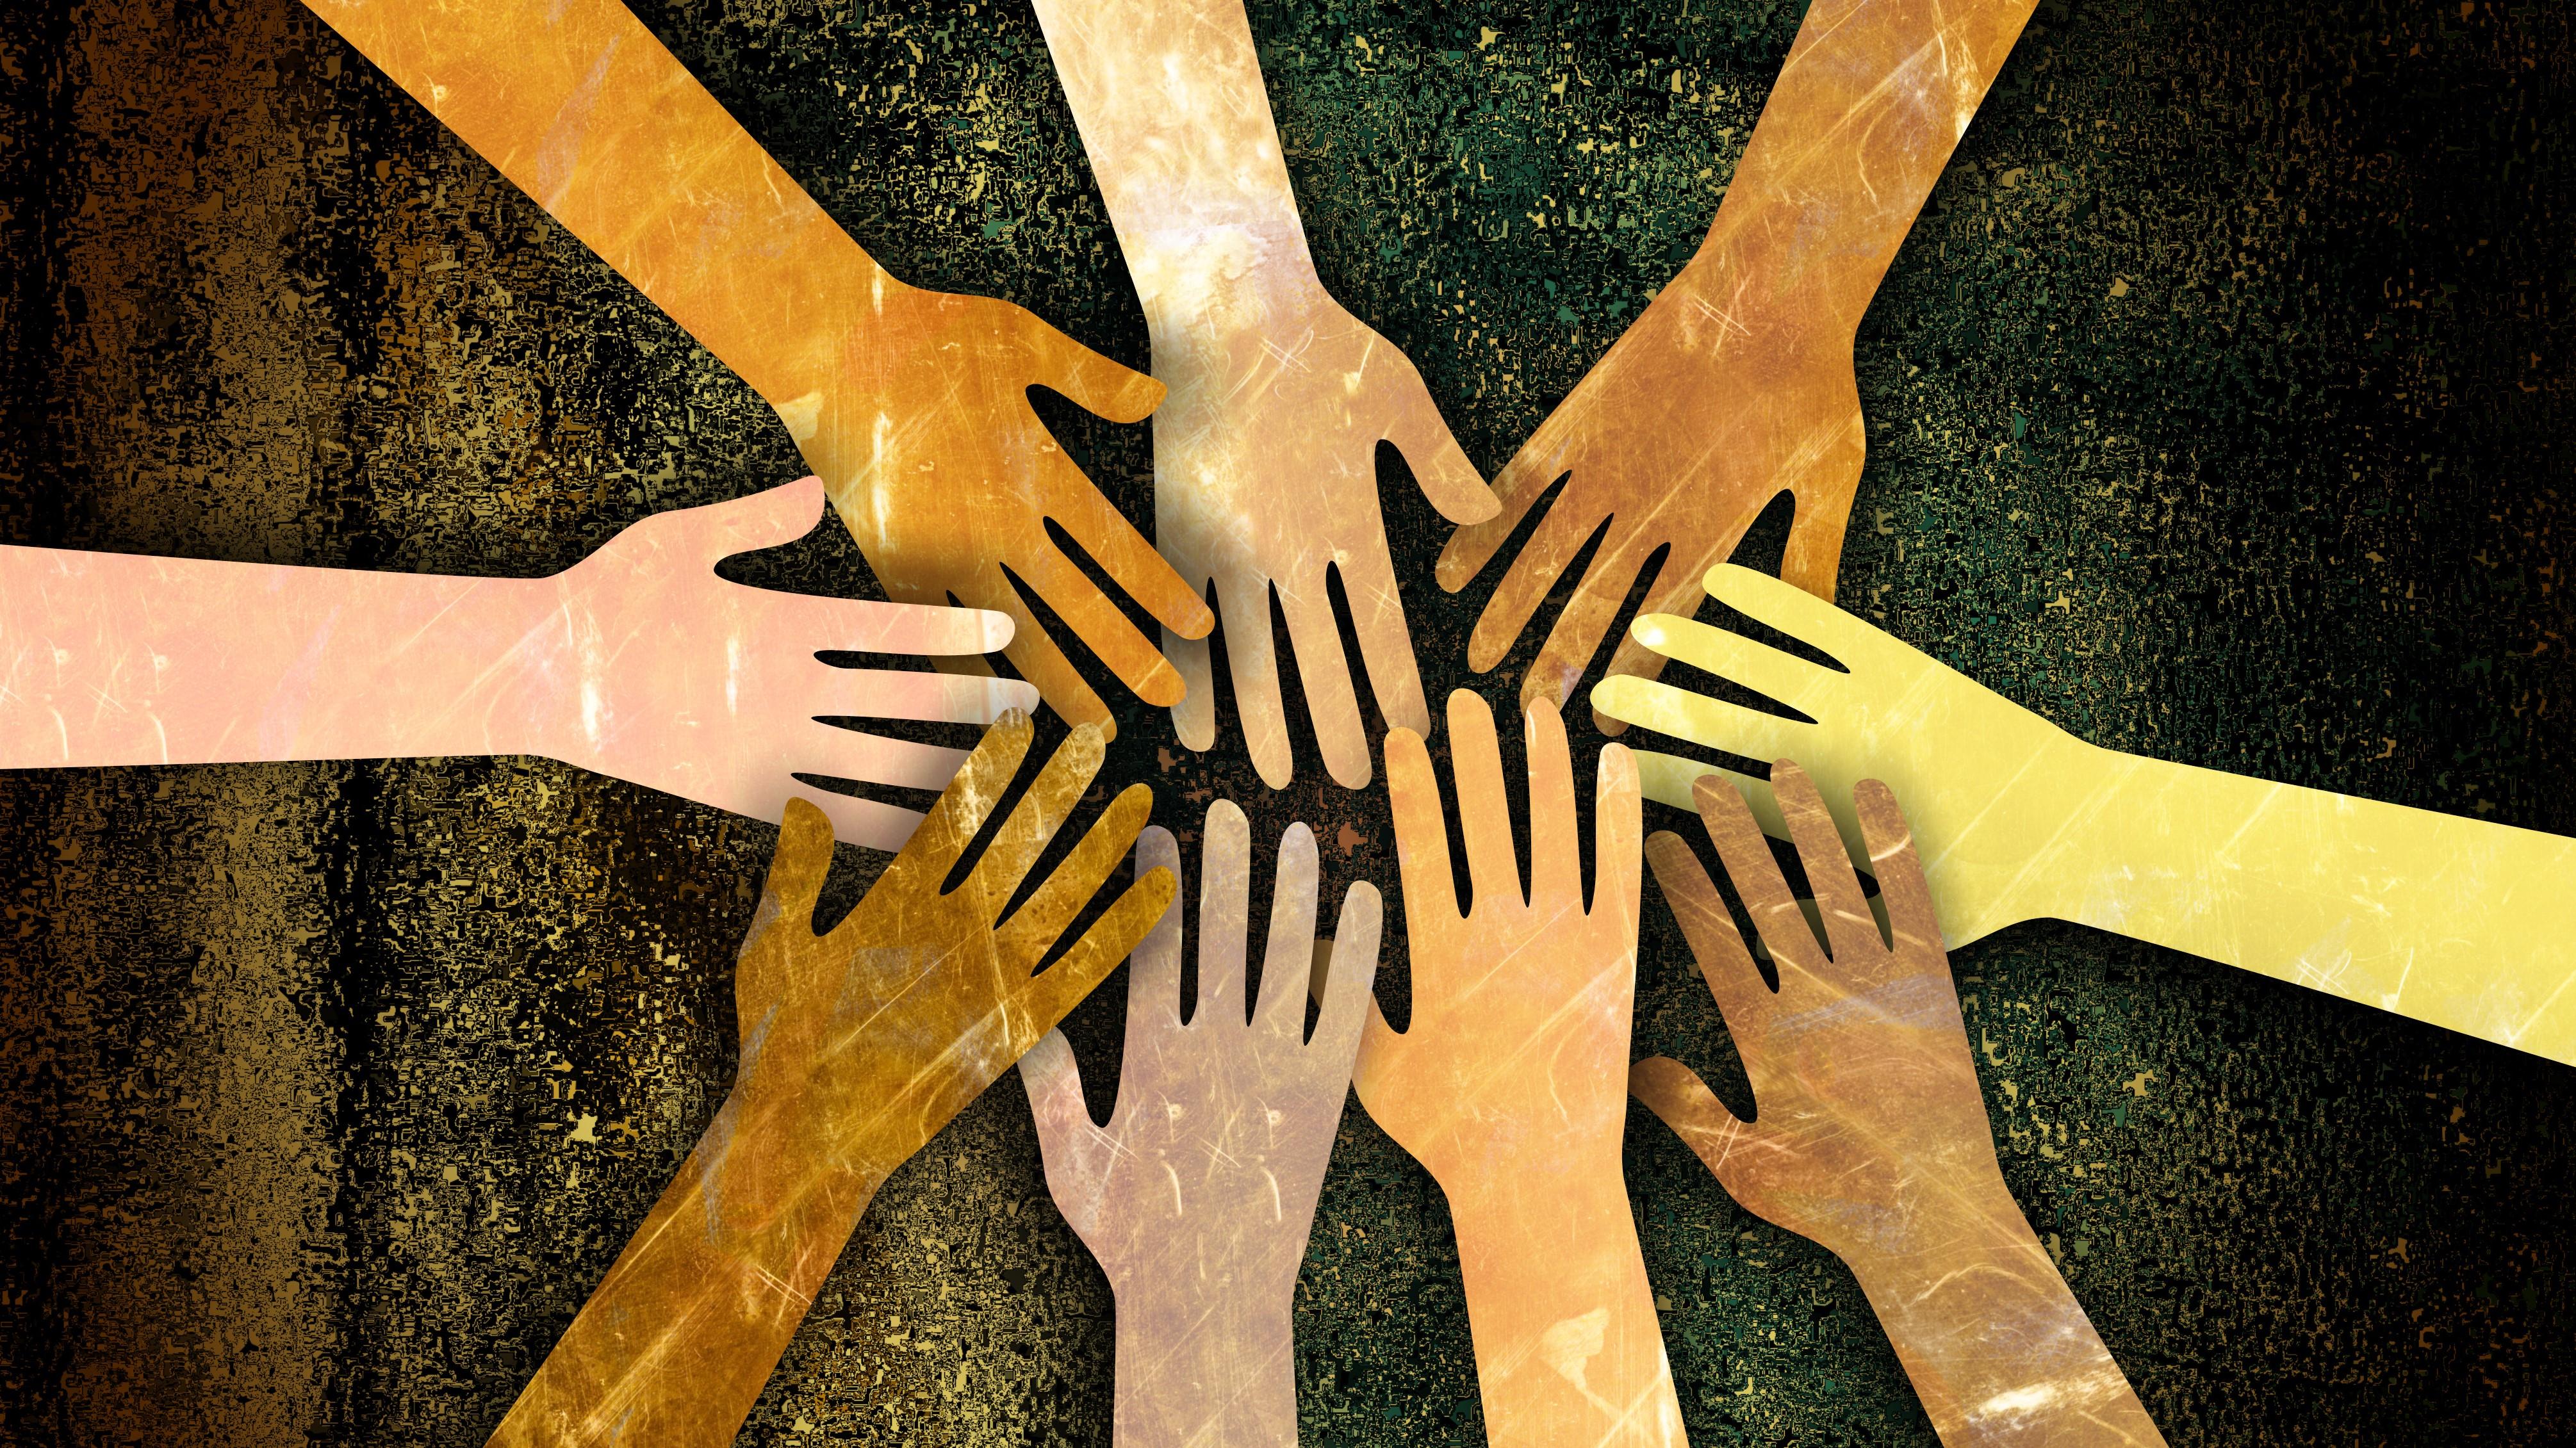 La integridad en la fe demanda reunir a gente diversa